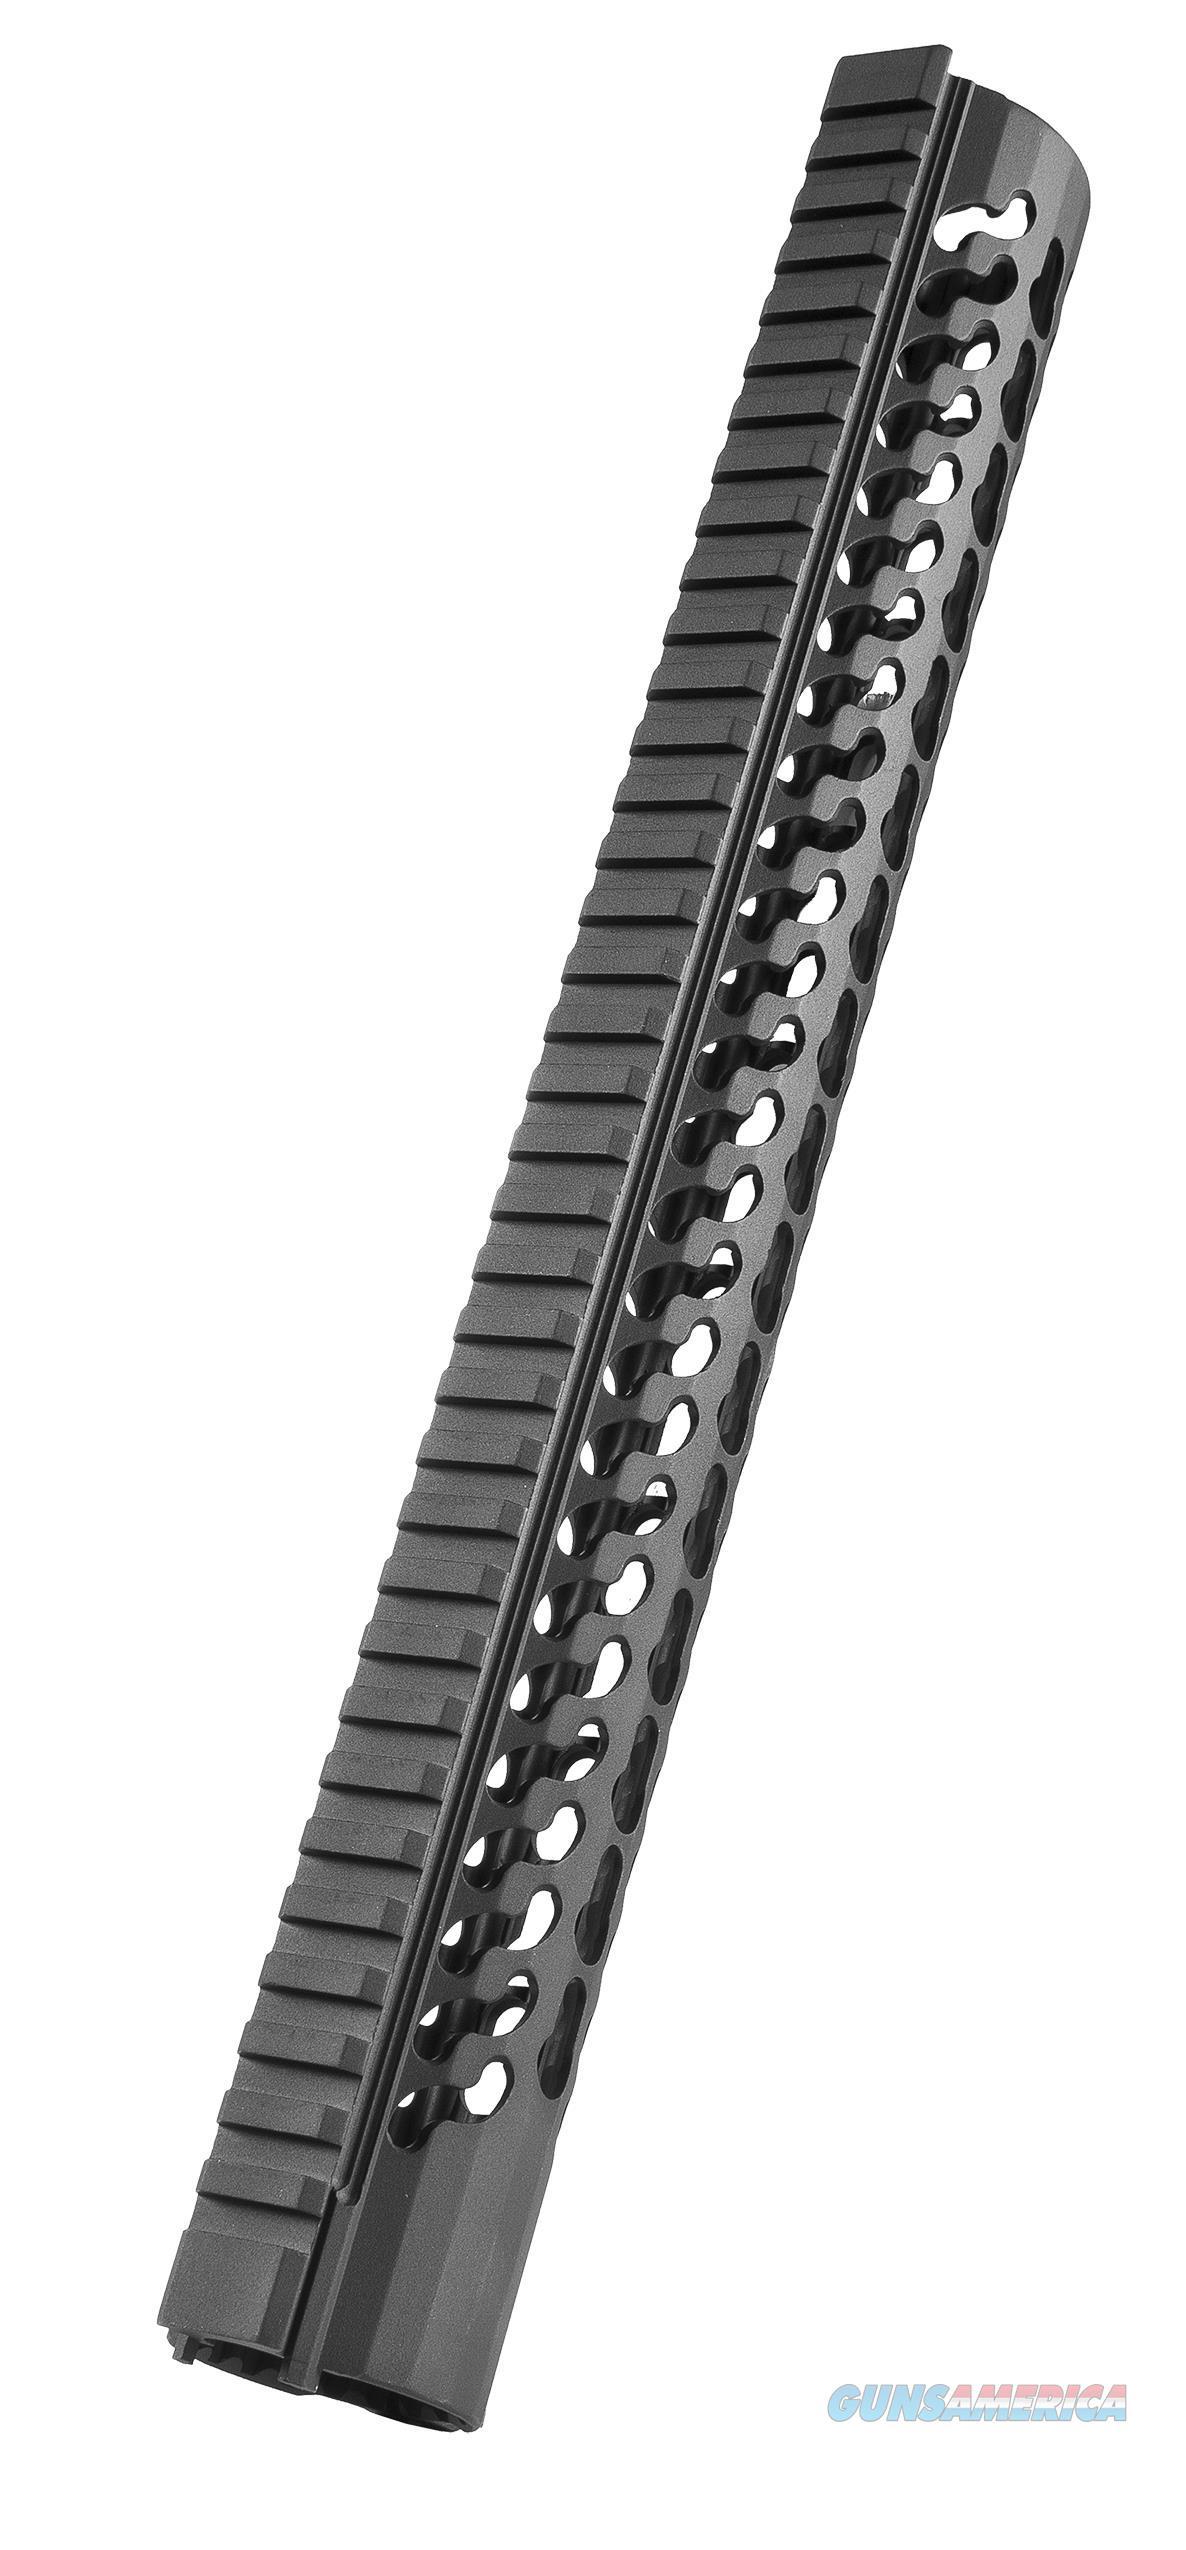 "Samson Km-Evo-15 Evolution Keymod Ar-15 Aluminum 15"" Rail Black KM-EVO-15  Non-Guns > Gunstocks, Grips & Wood"